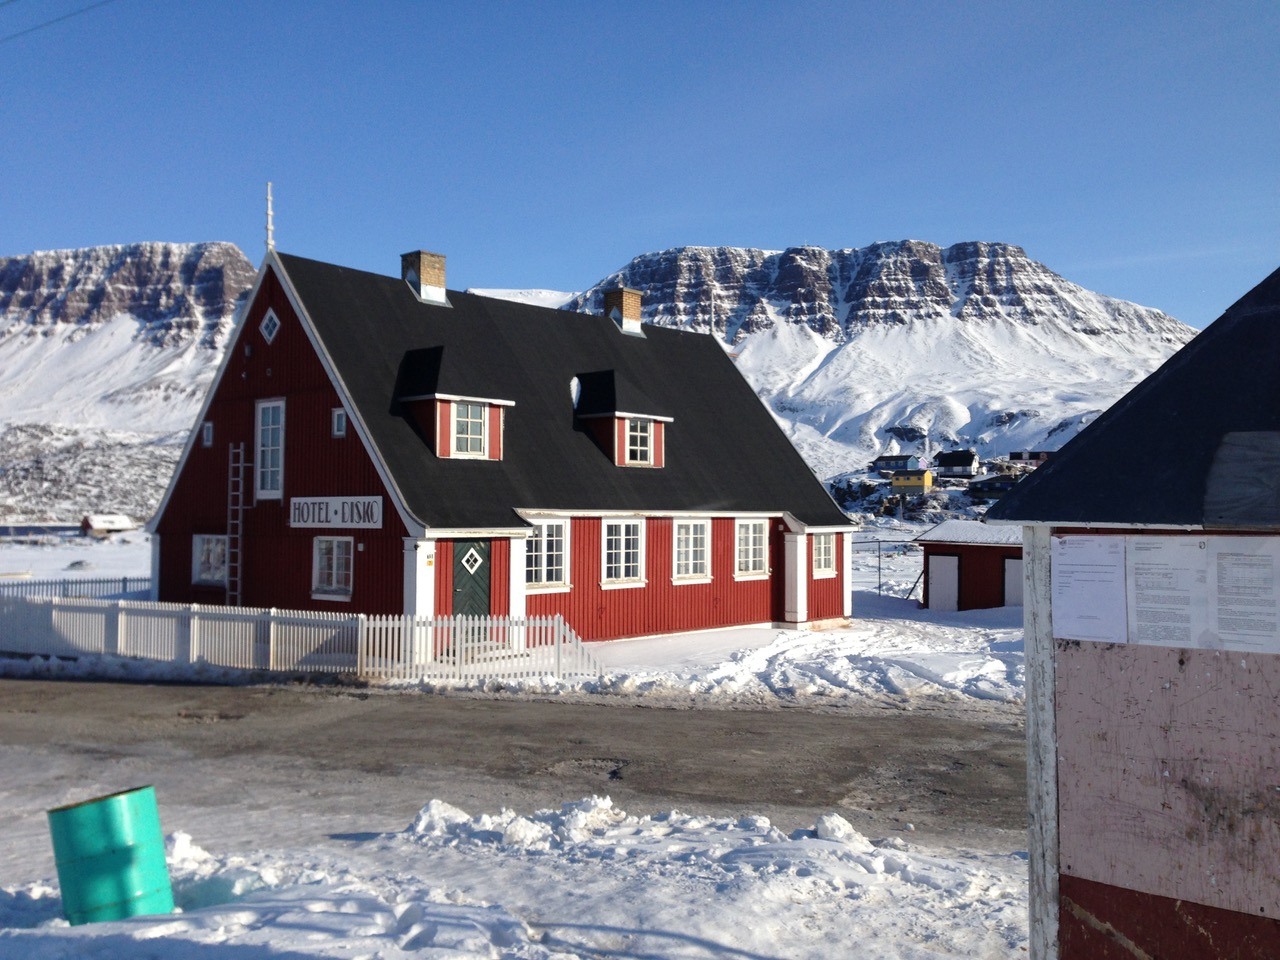 Hotel Disko in Qerqertarsuaq